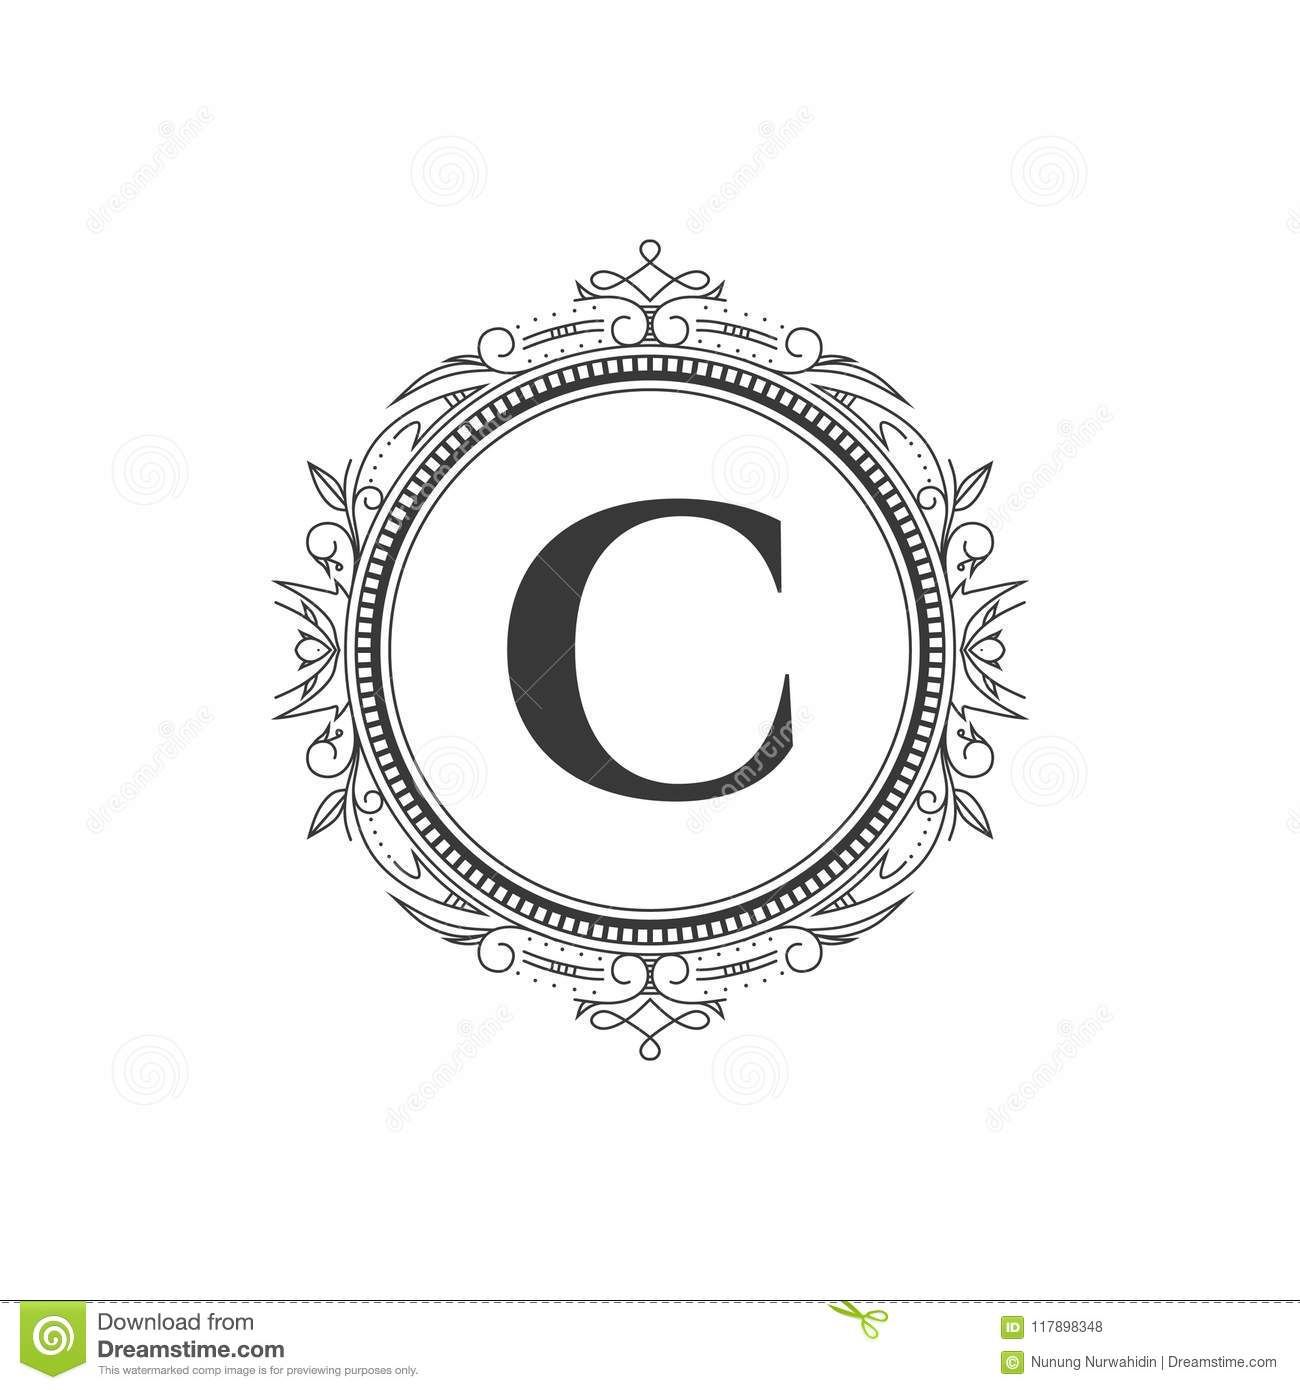 Letter C Monogram Template